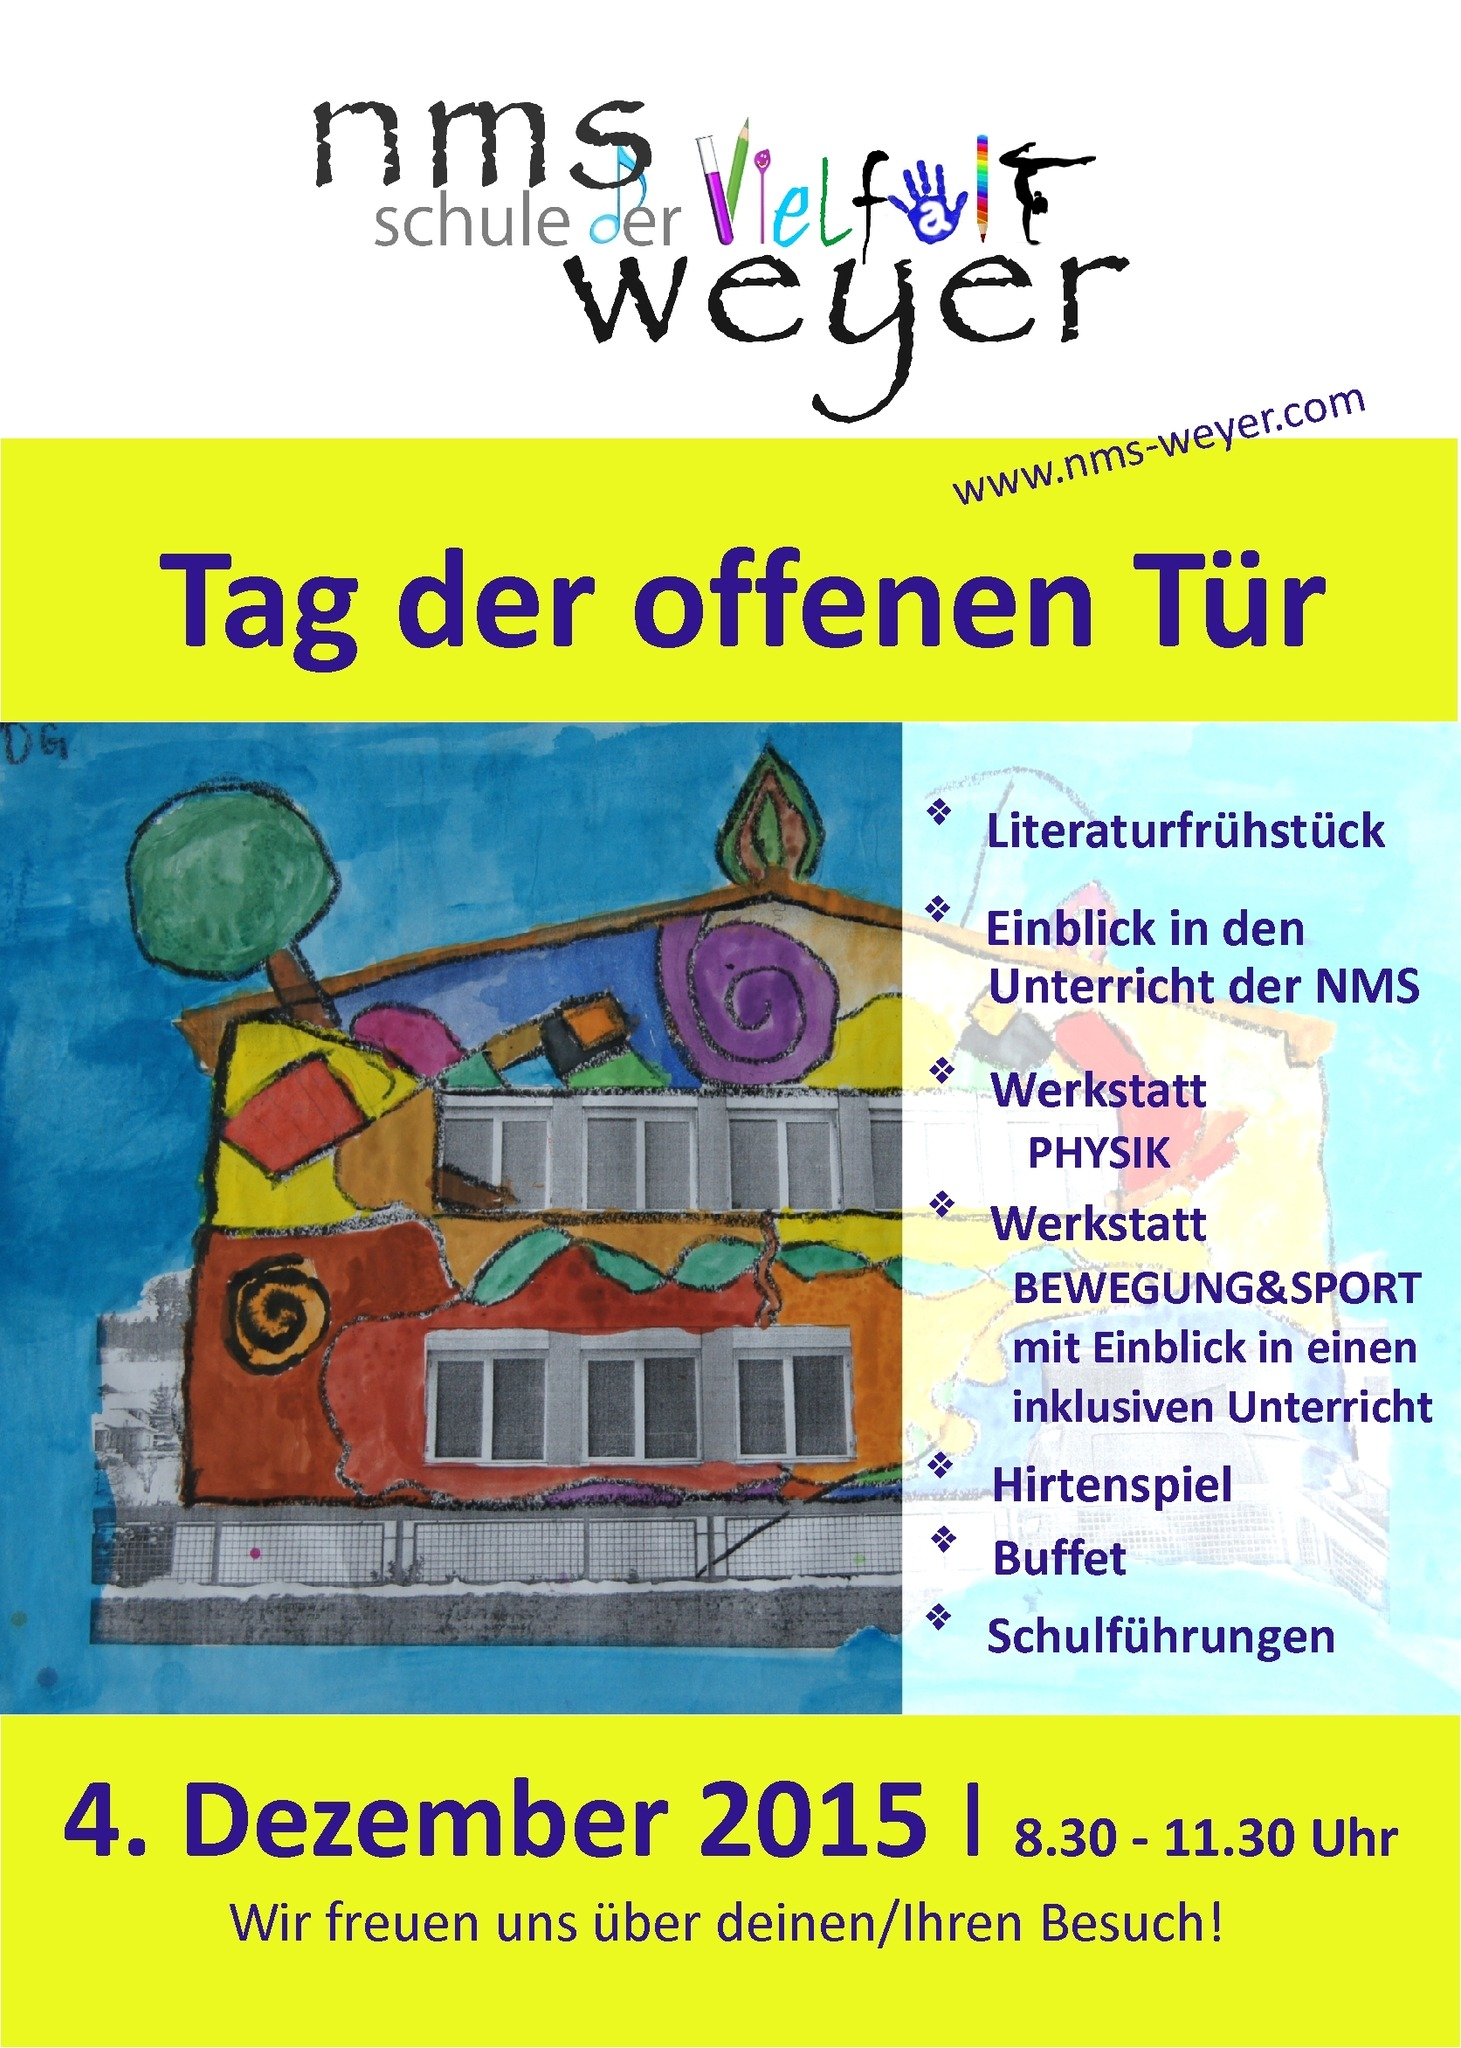 Rotes Kreuz Weyer - Thema auf bubble-sheet.com